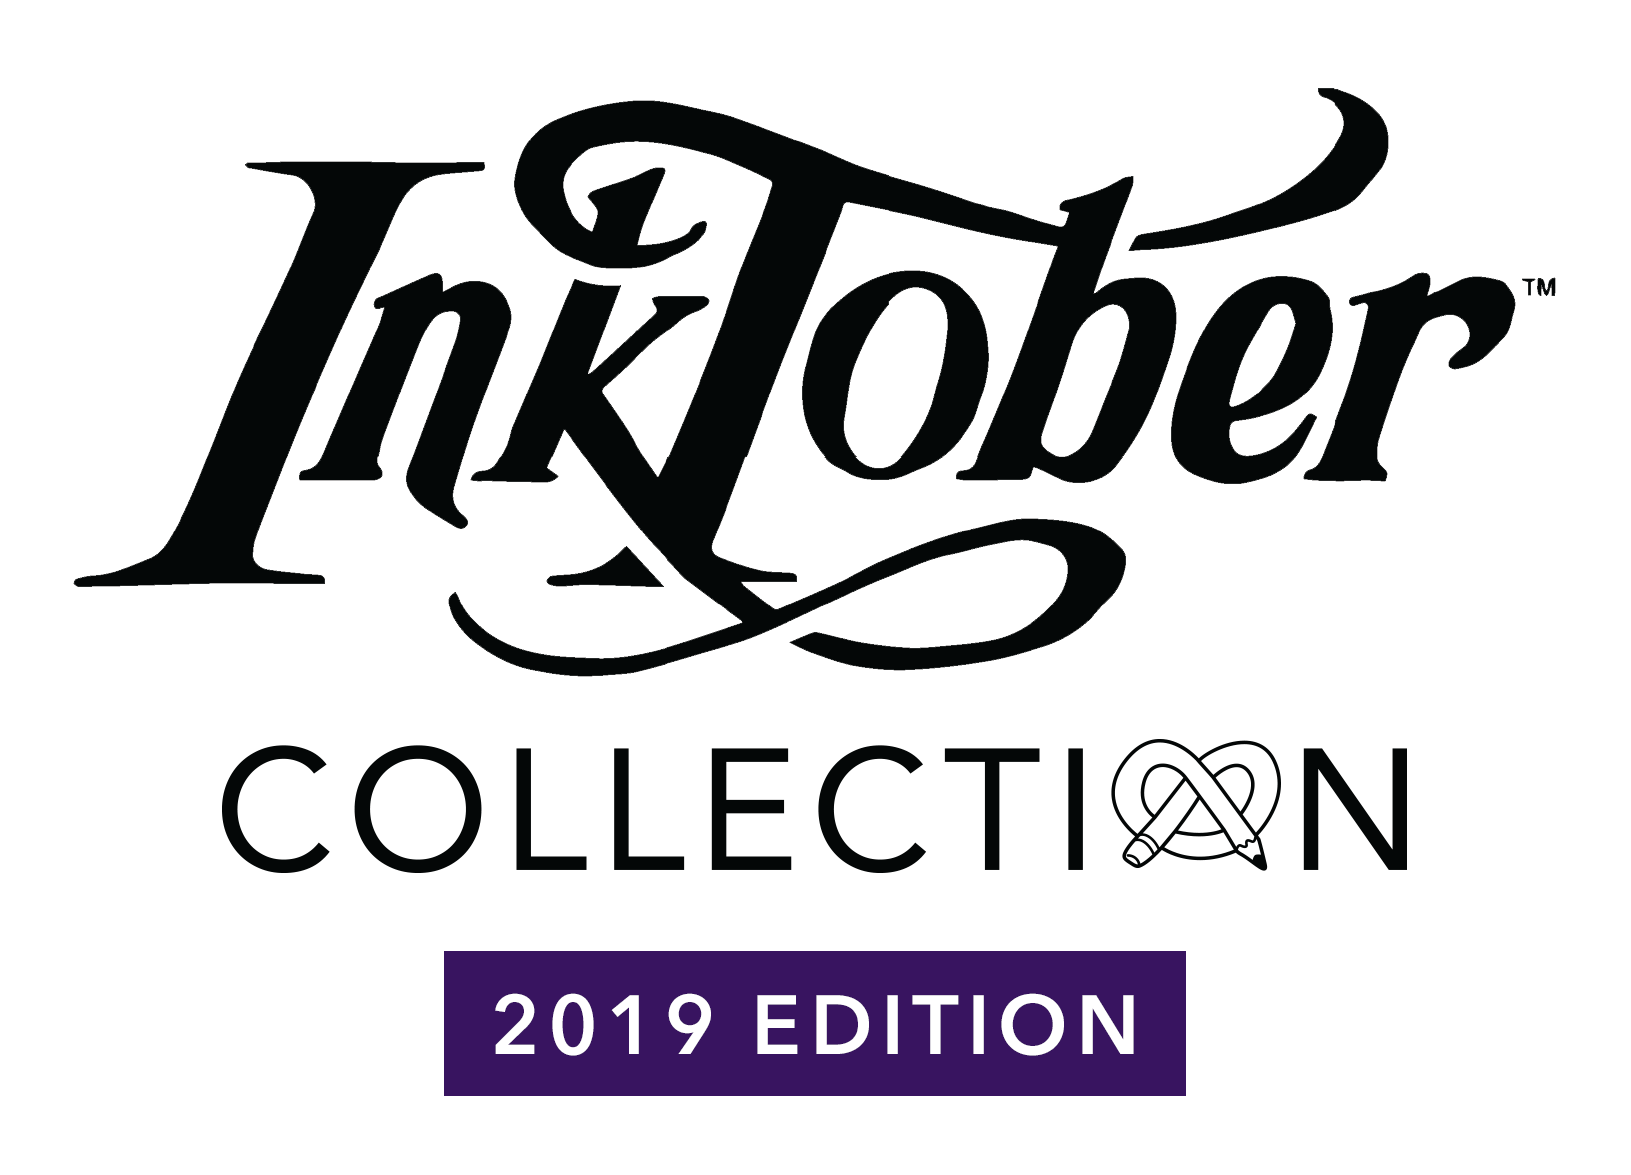 2019inktober_logo_Final.png